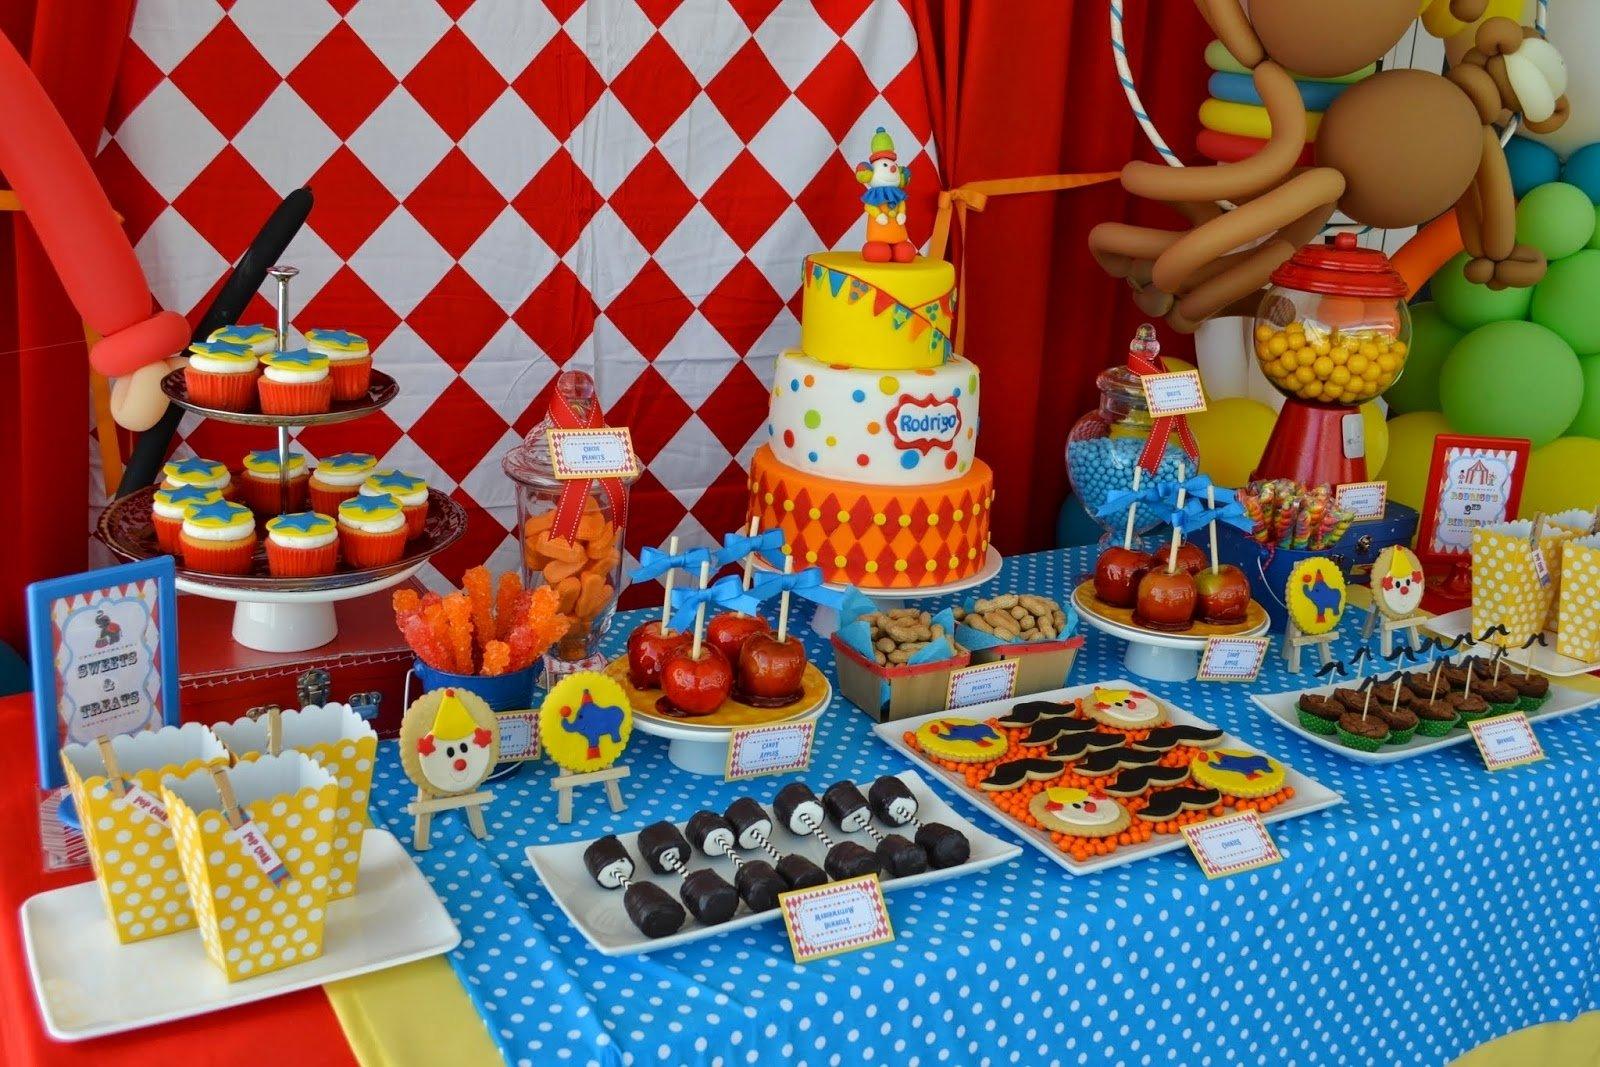 10 Lovely 4 Yr Old Boy Birthday Party Ideas themes birthday 3 year old birthday party ideas at home with 13 9 2021